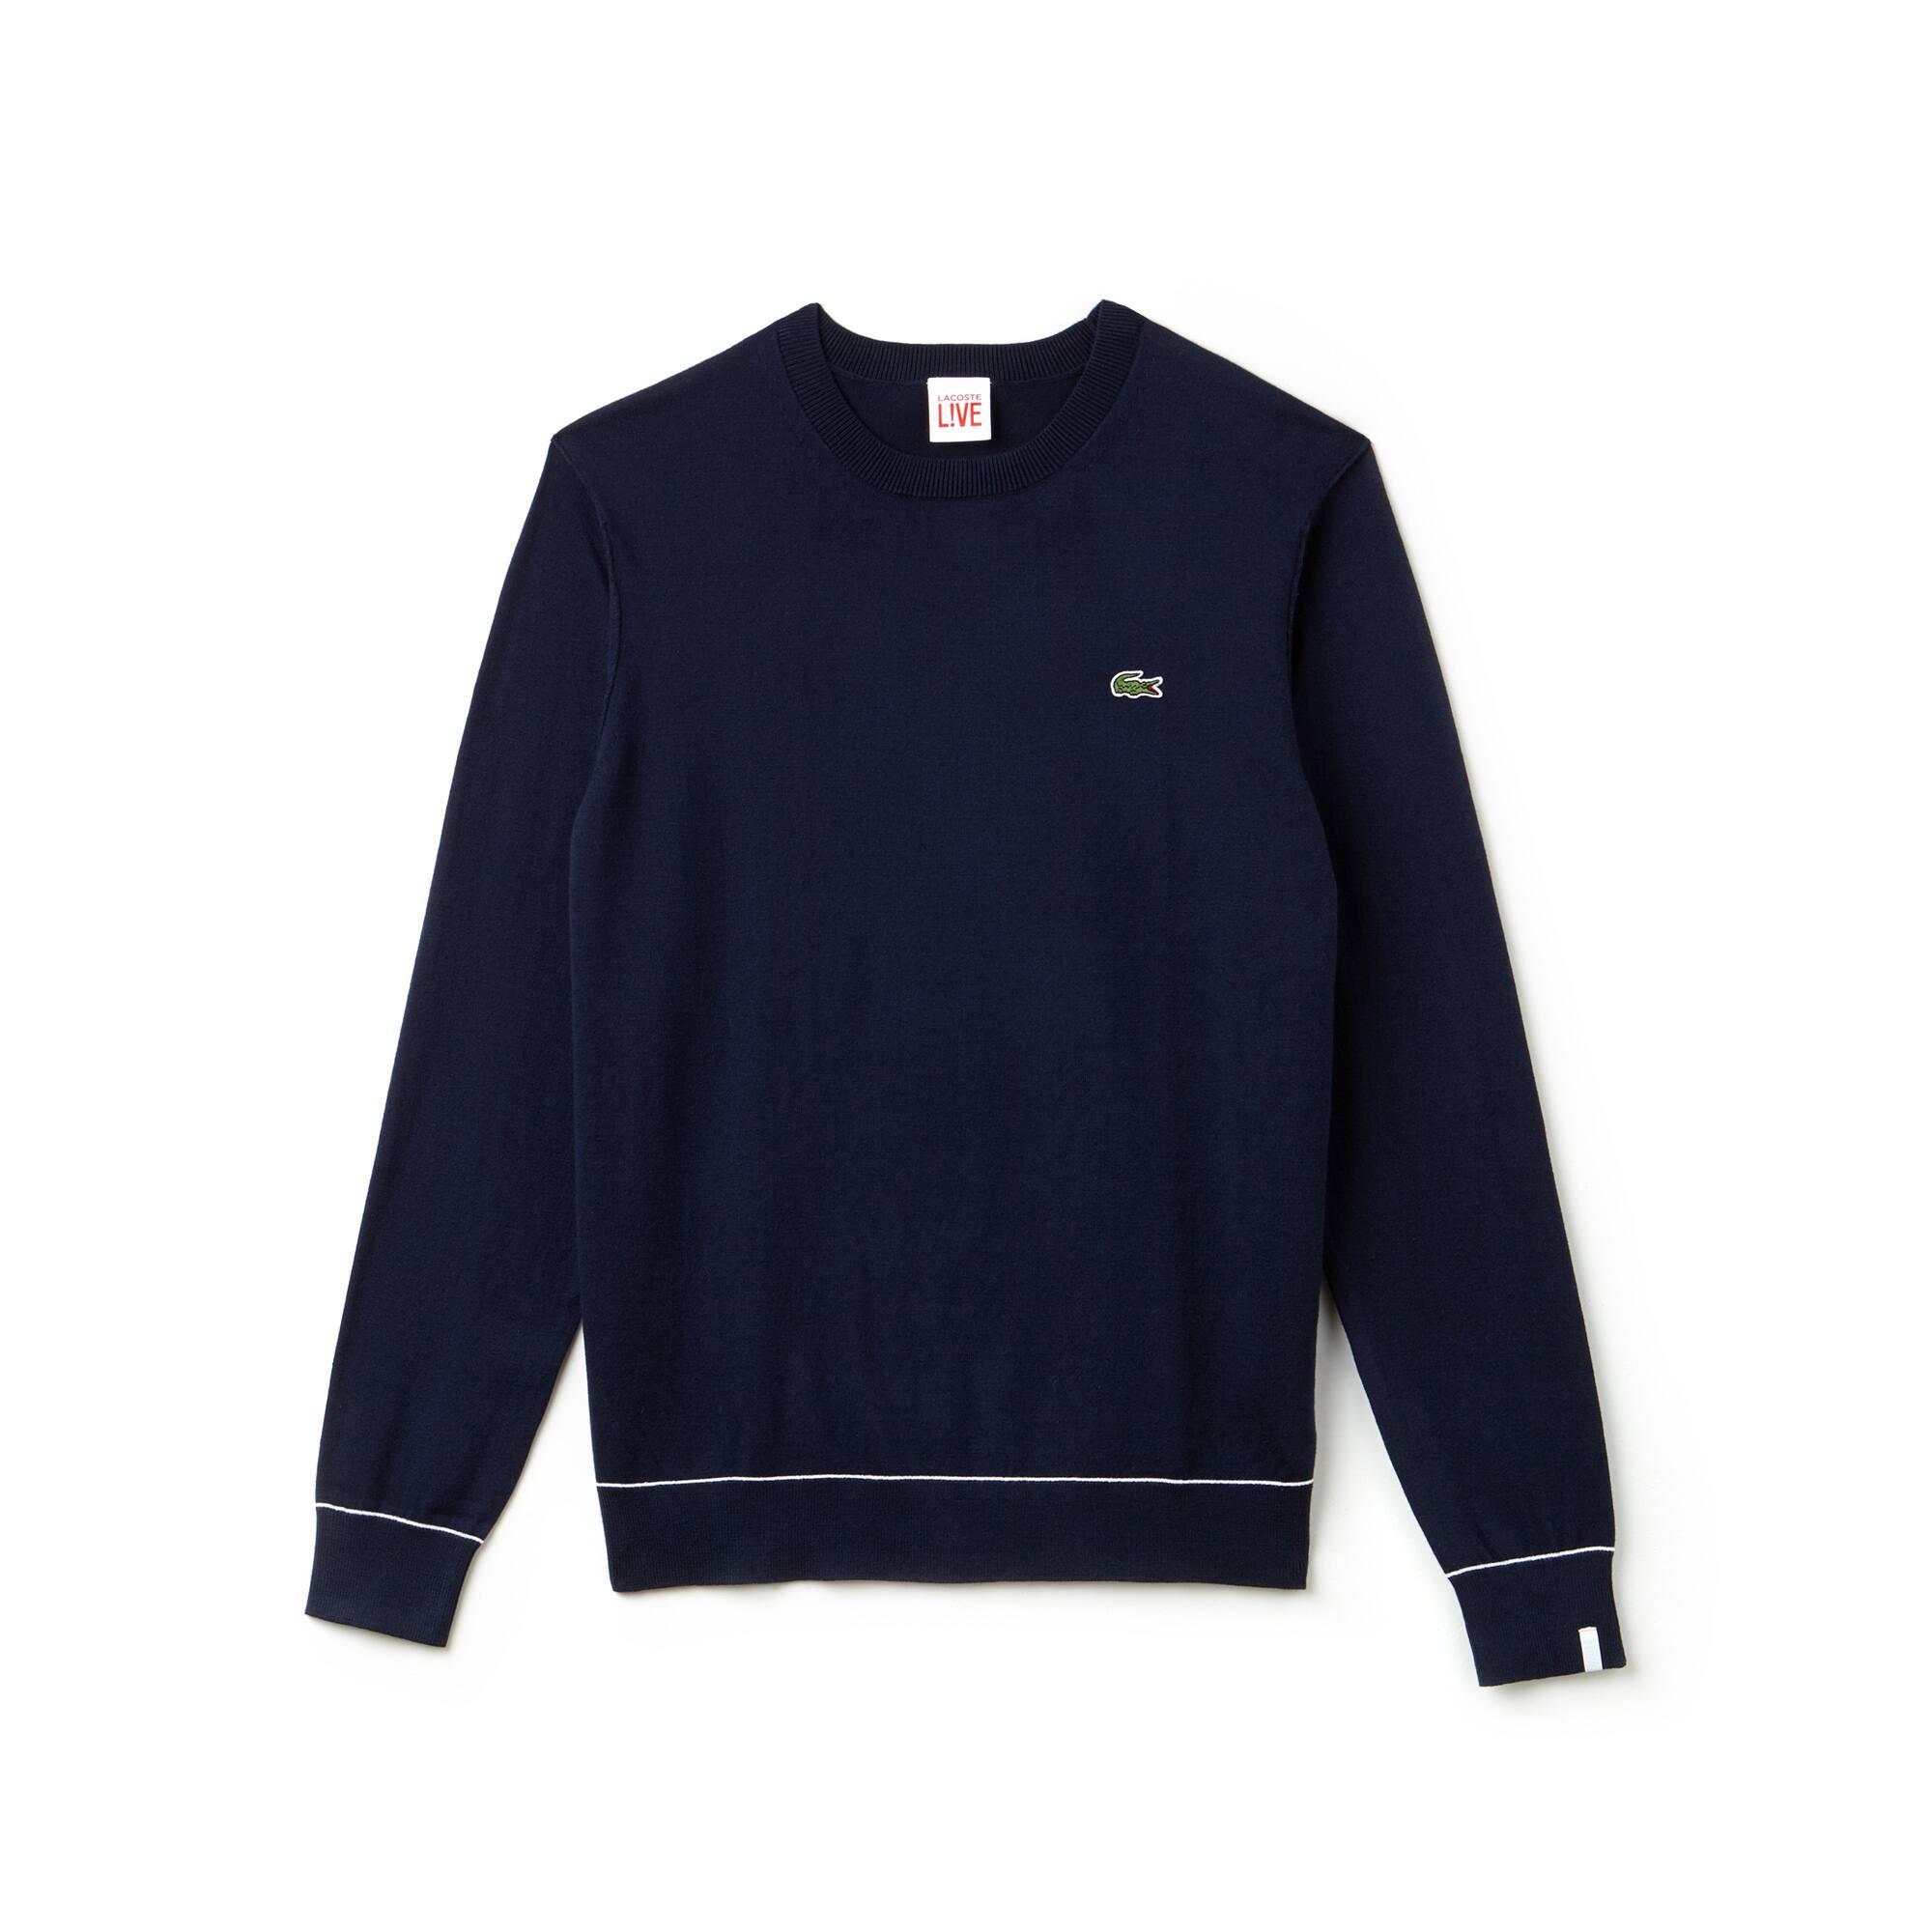 Men\u0027s Lacoste LIVE Crew Neck Cotton And Silk Jersey Sweater ...